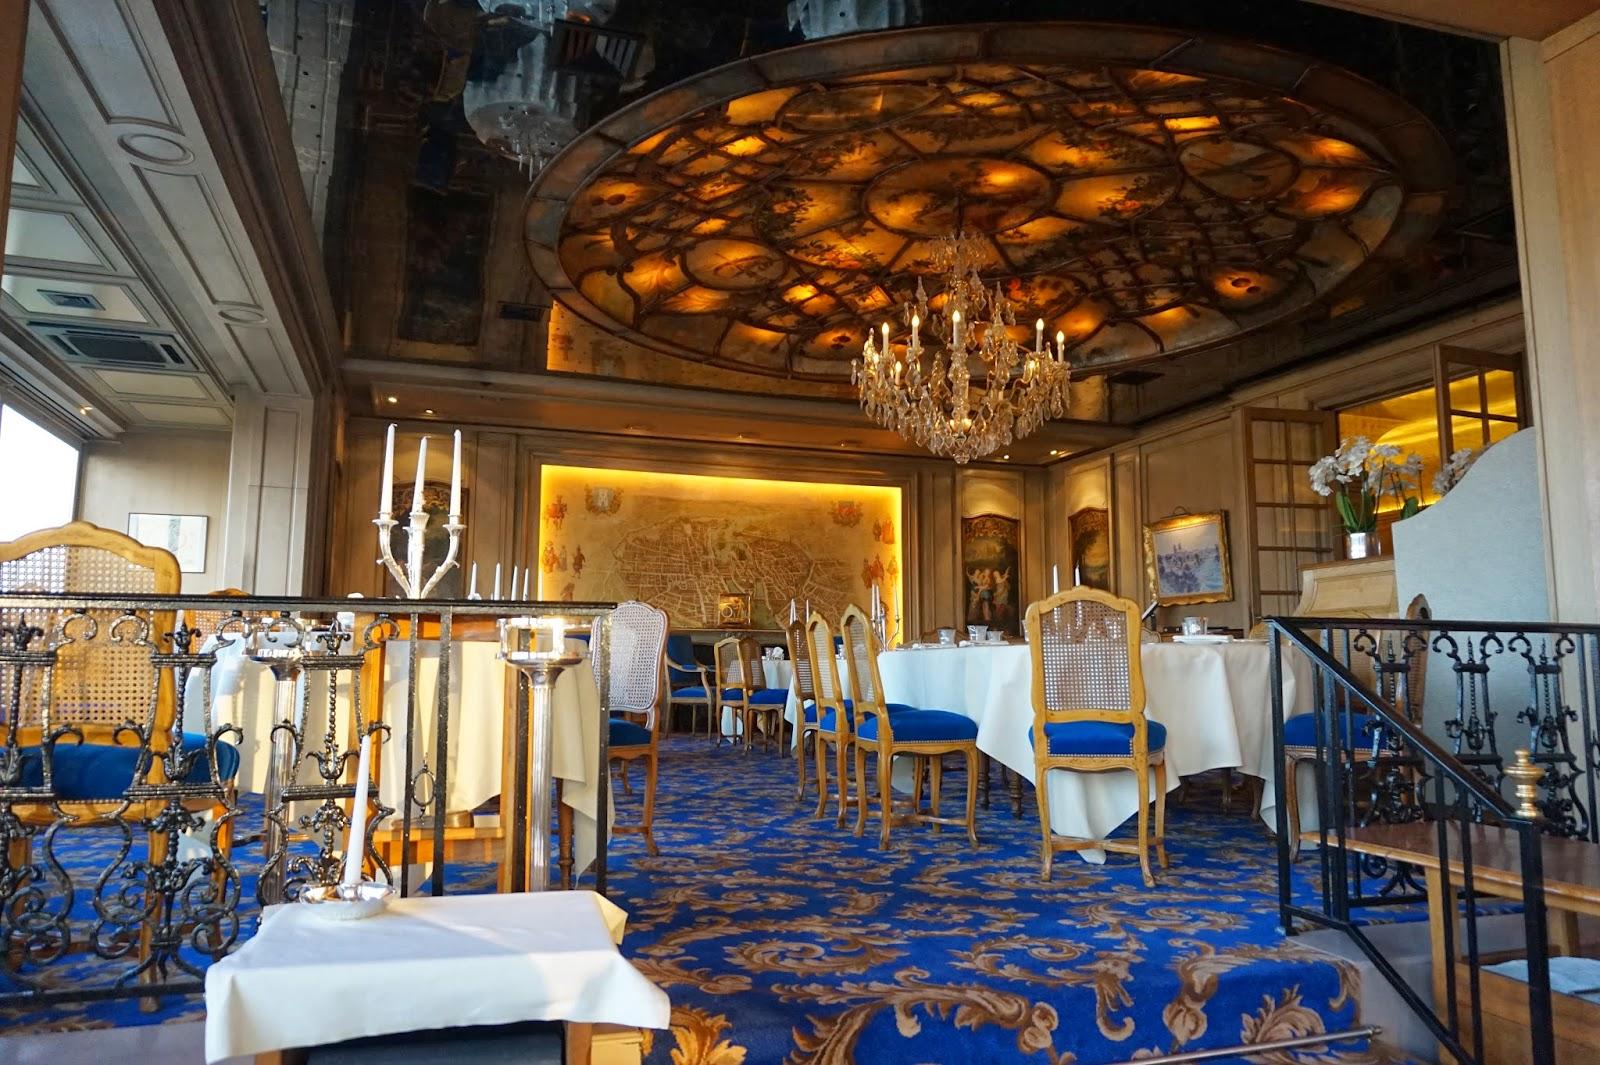 Painting Dining Room Review Of La Tour D Argent Restaurant In Paris France